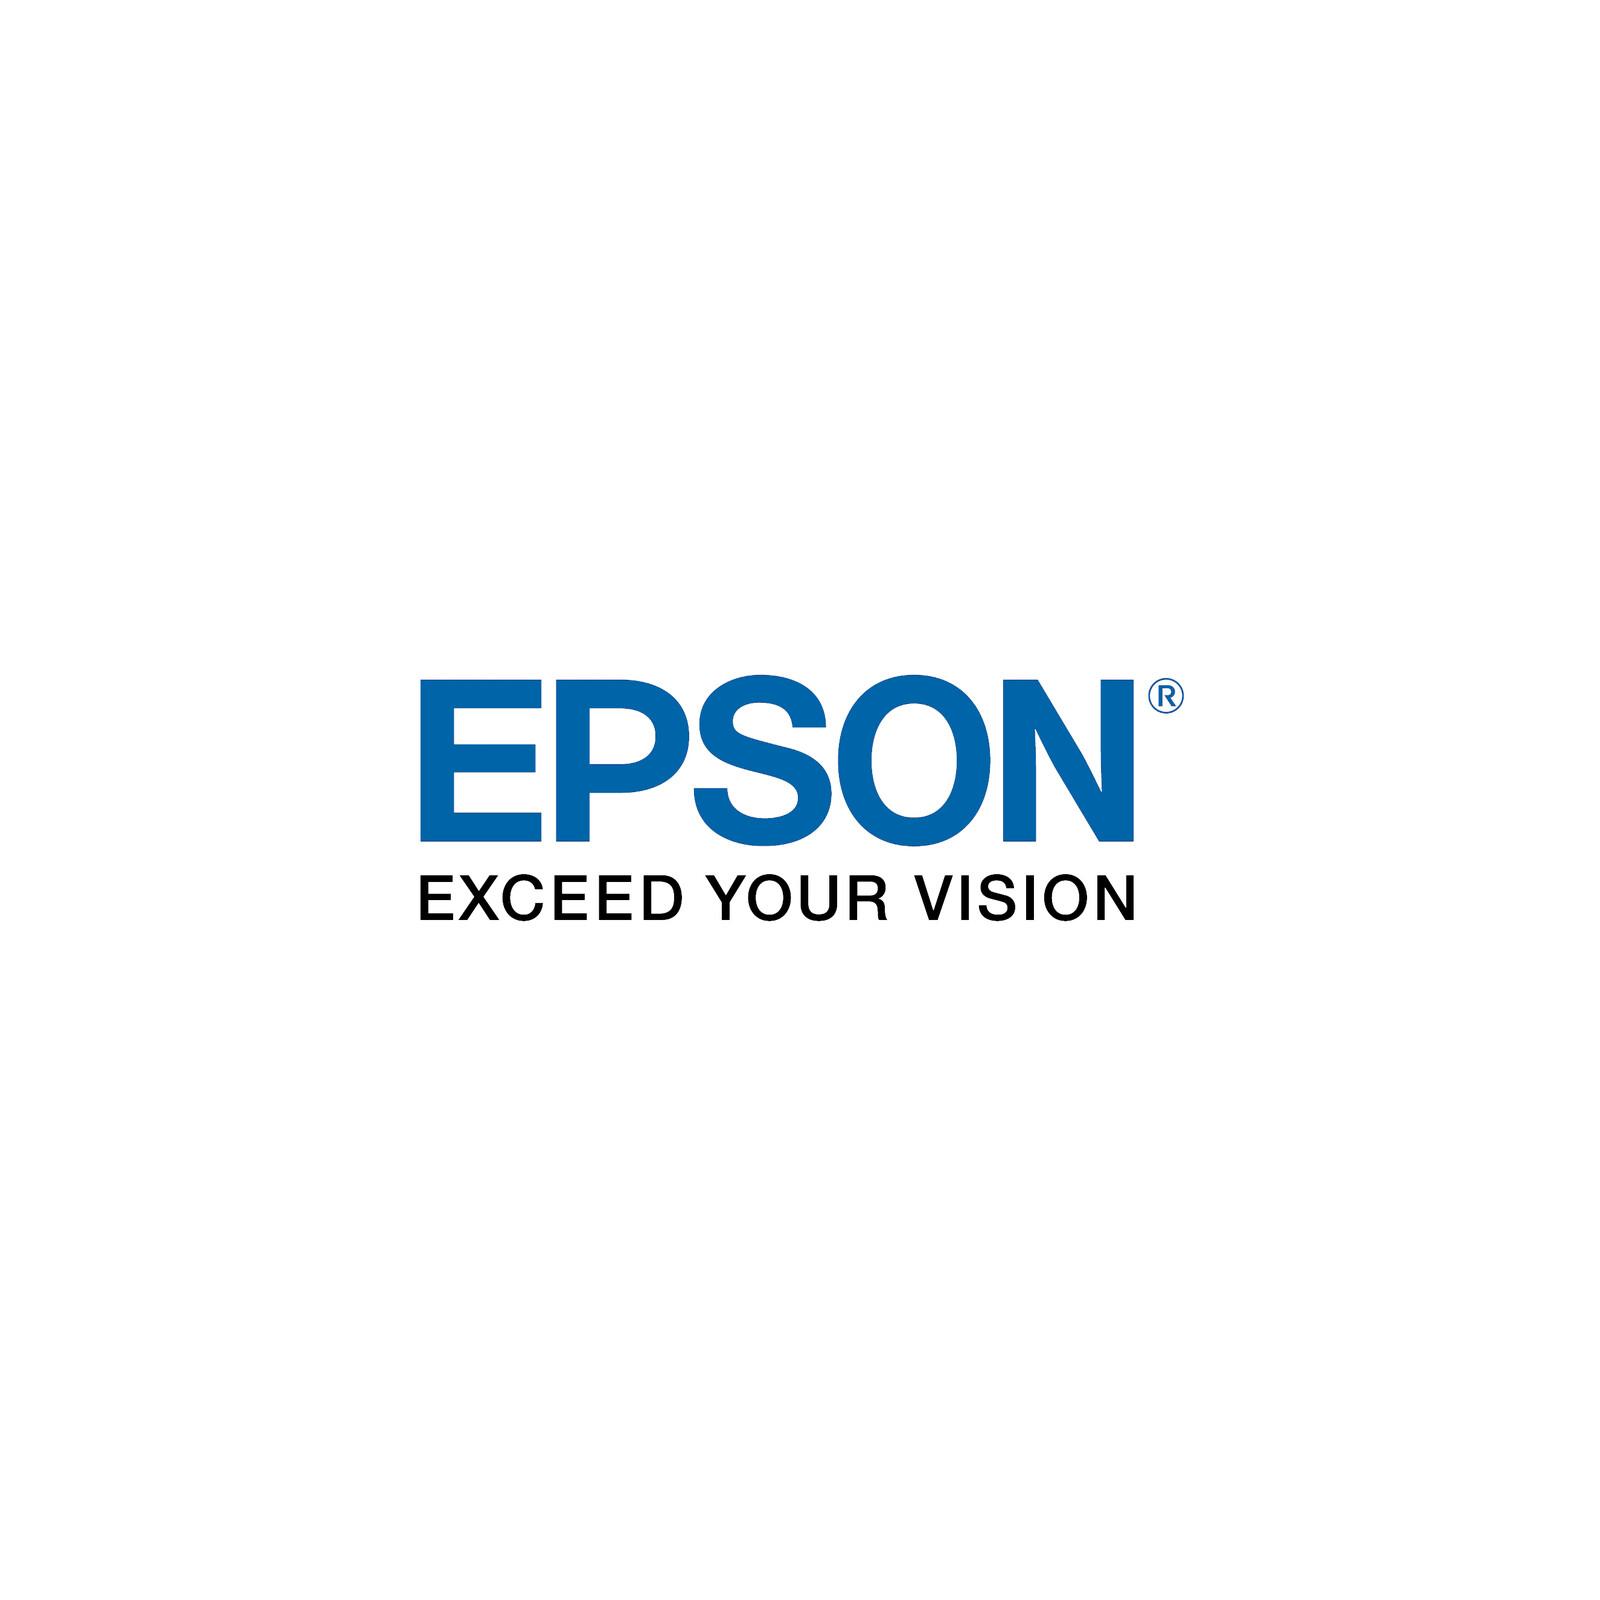 Epson 635 S015073 Nylon 4-färbig